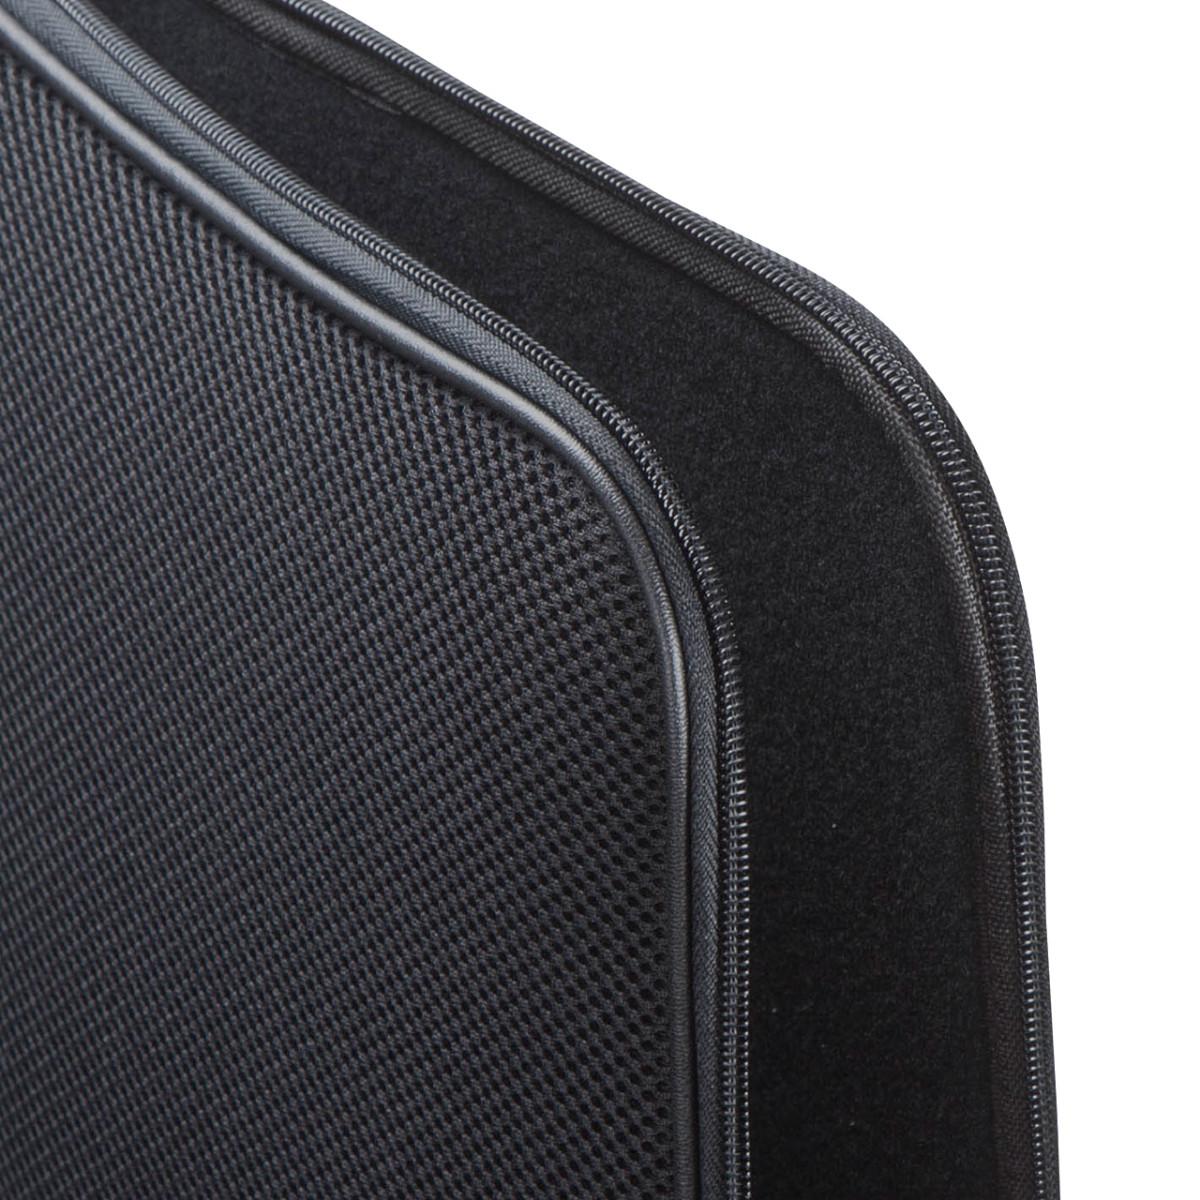 [IN-SG13BK] 【代引き不可】低反発3Dメッシュケース(13.3インチ対応・ブラック)